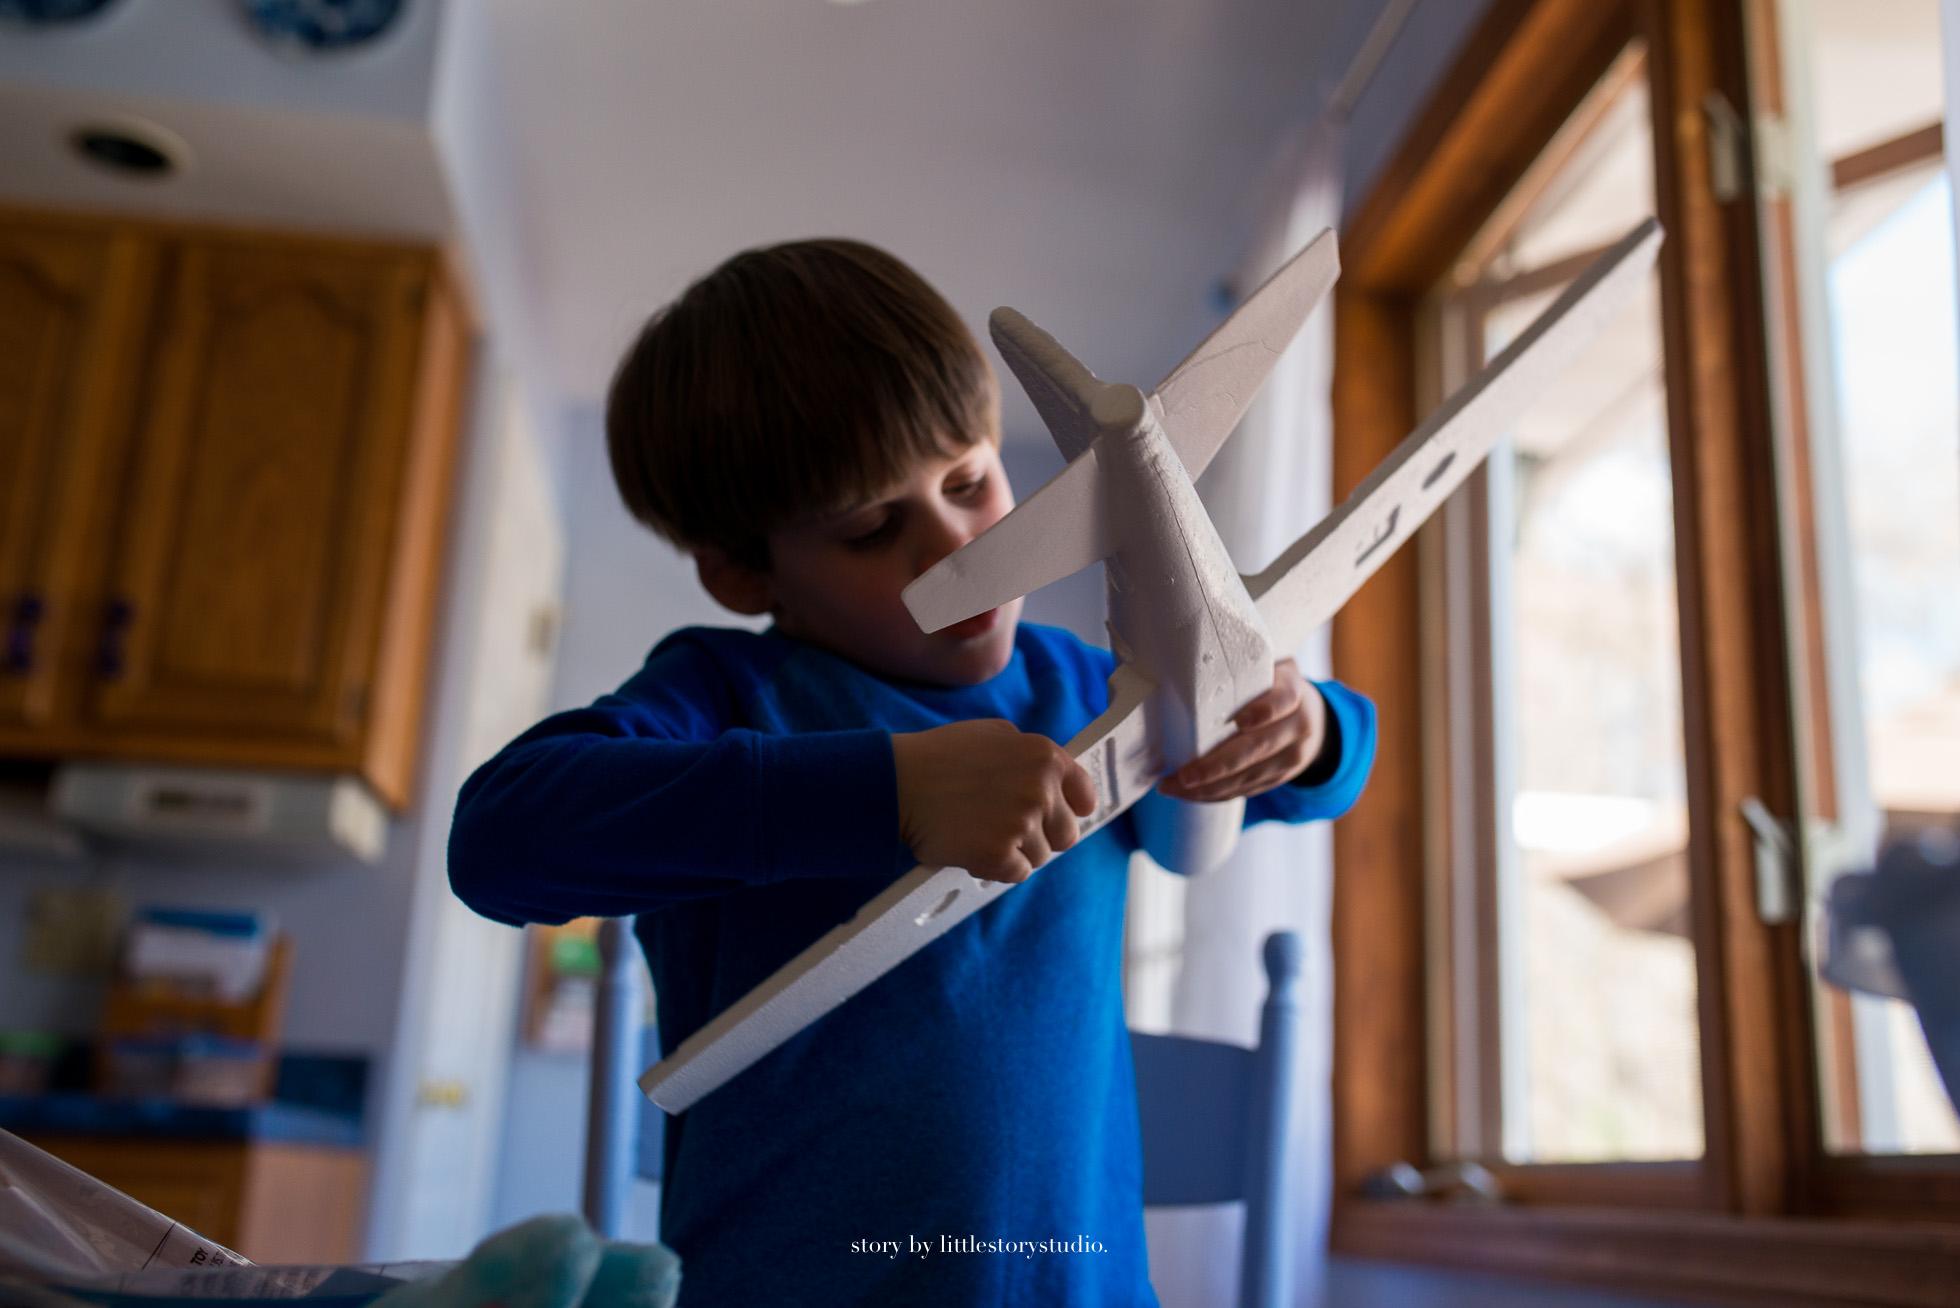 boy-putting-together-styrofoam-toy-plane